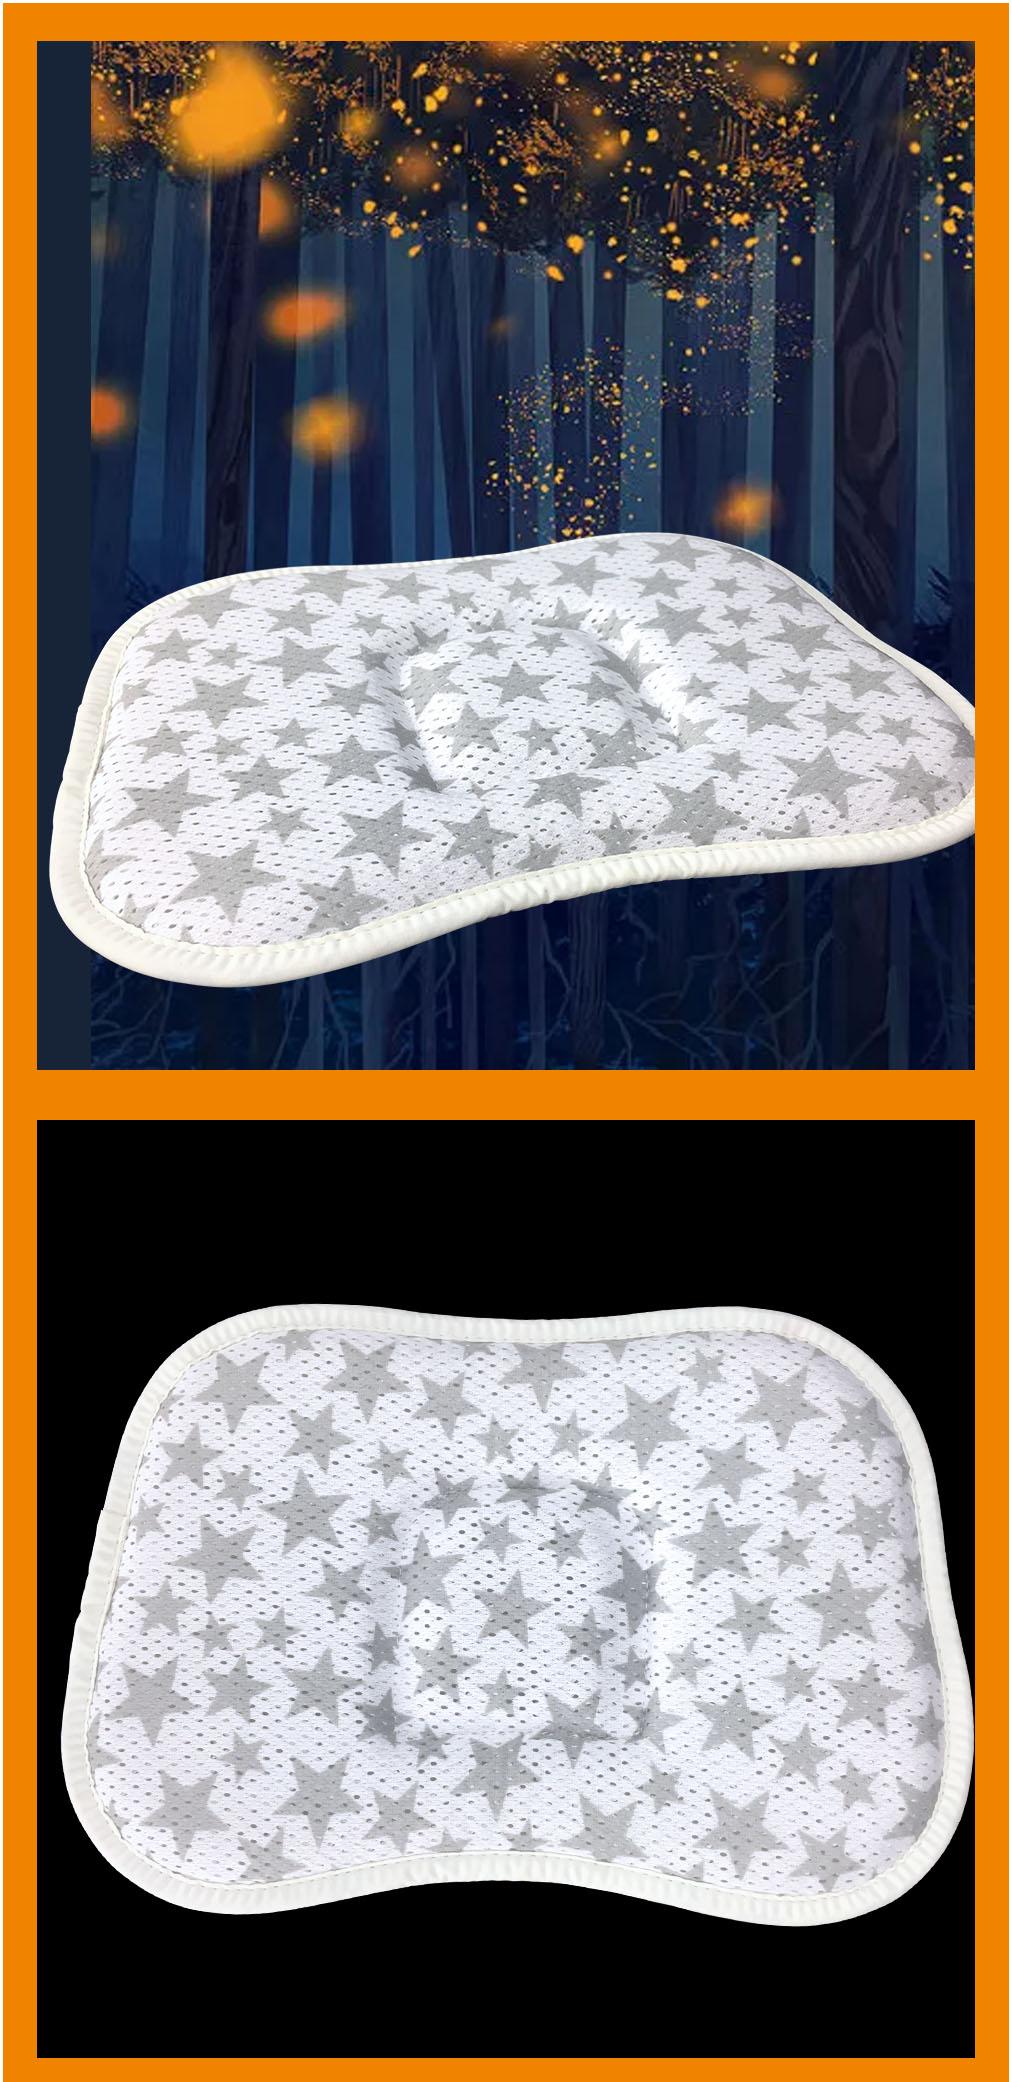 Wholesale soft newborn nursing pillow floral 3d air cool mesh fabric flat head baby pillow